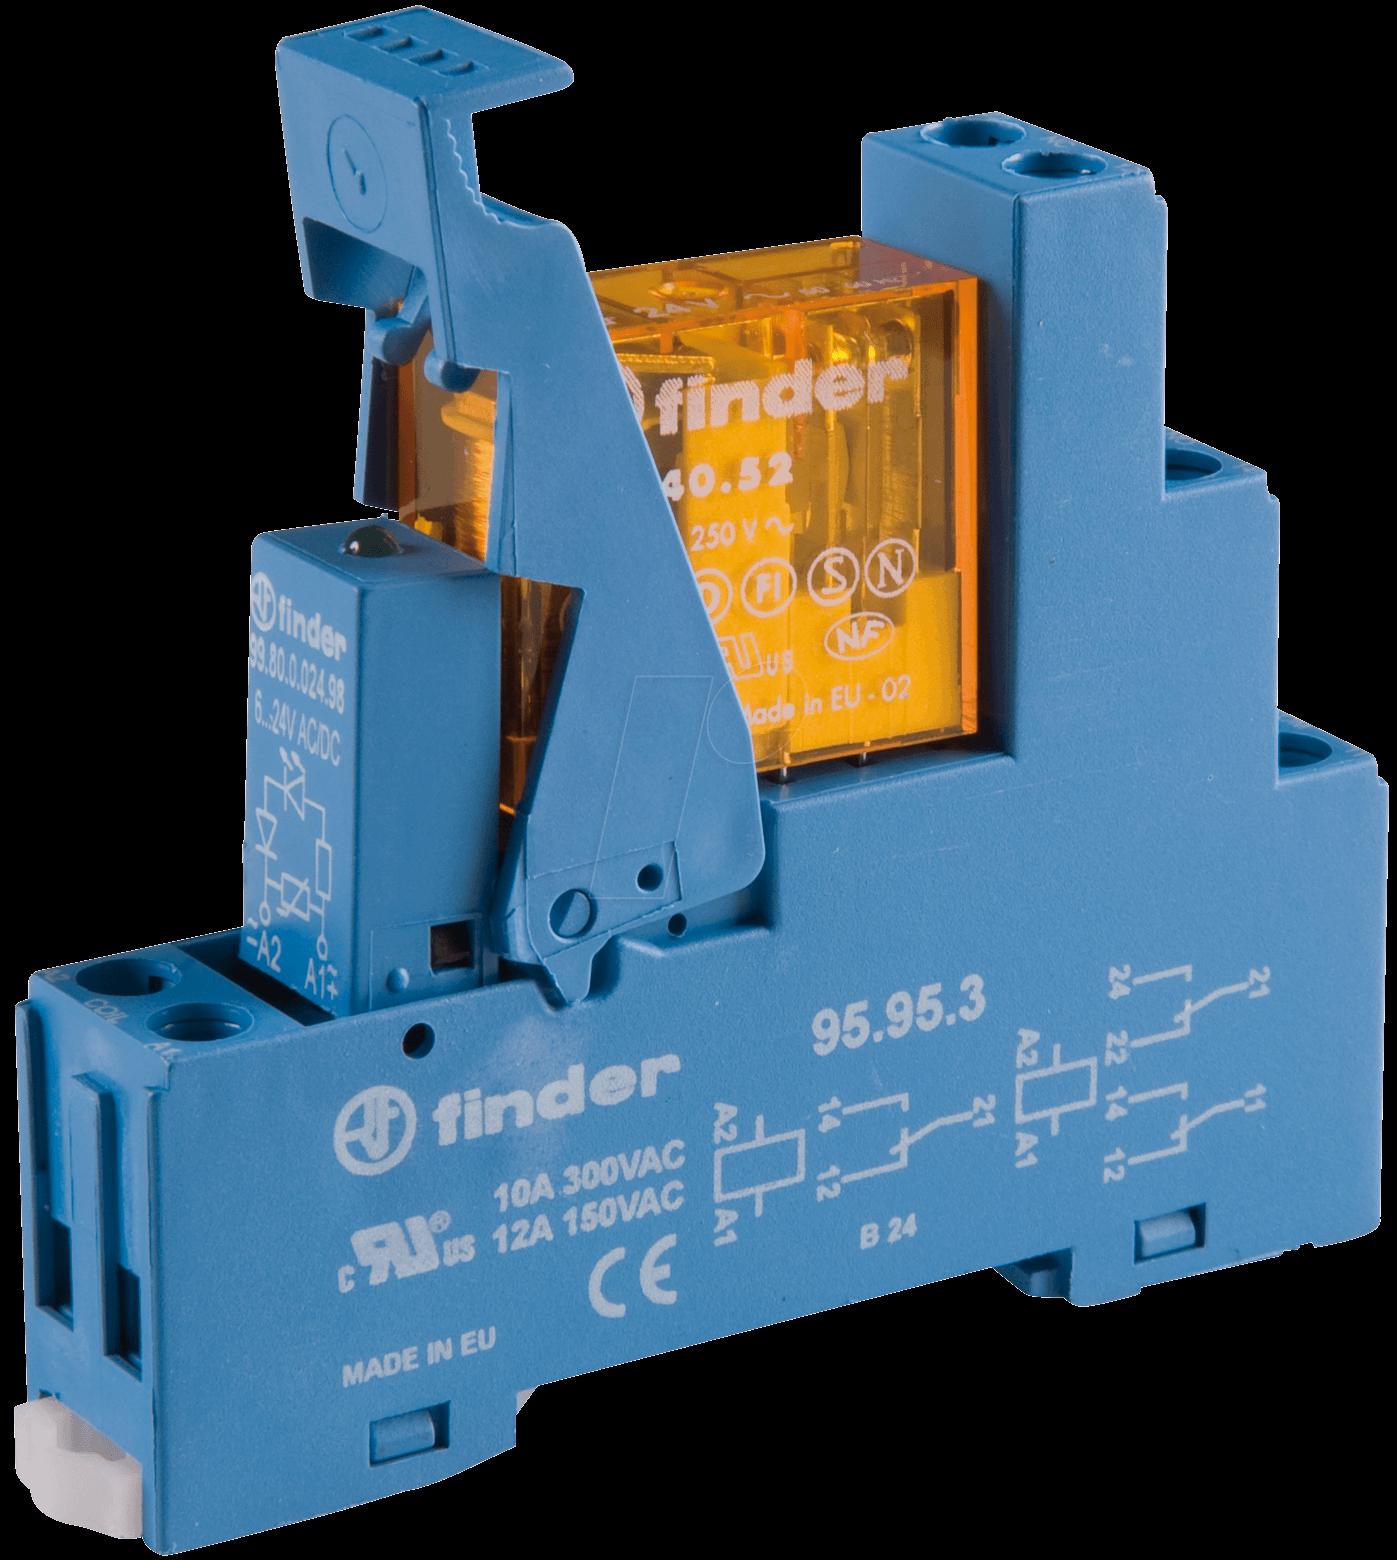 relais finder 24v